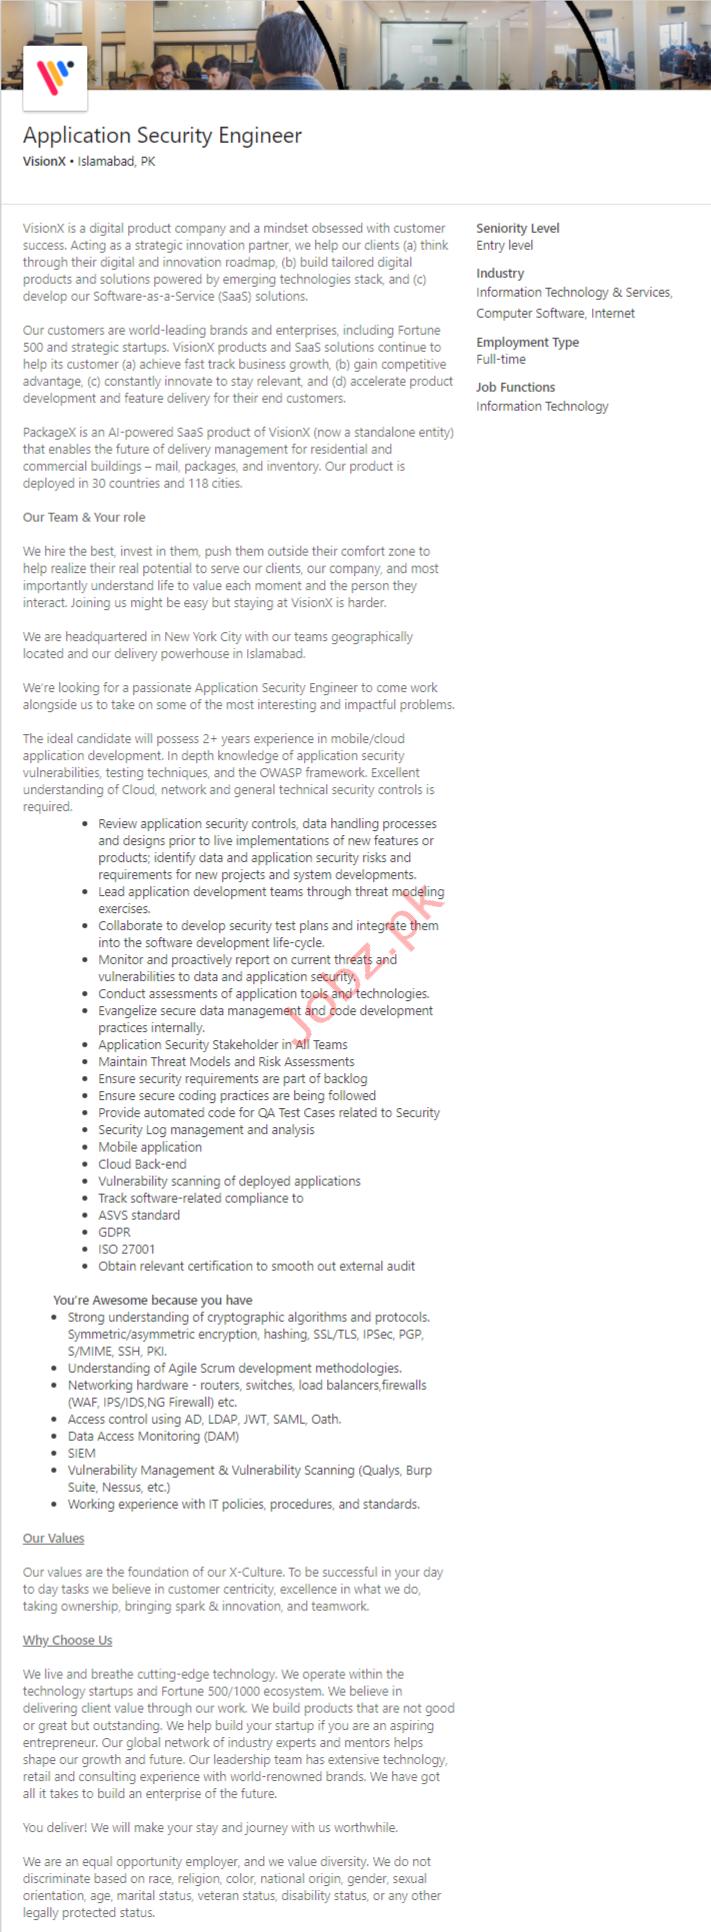 Application Security Engineer Jobs in Islamabad